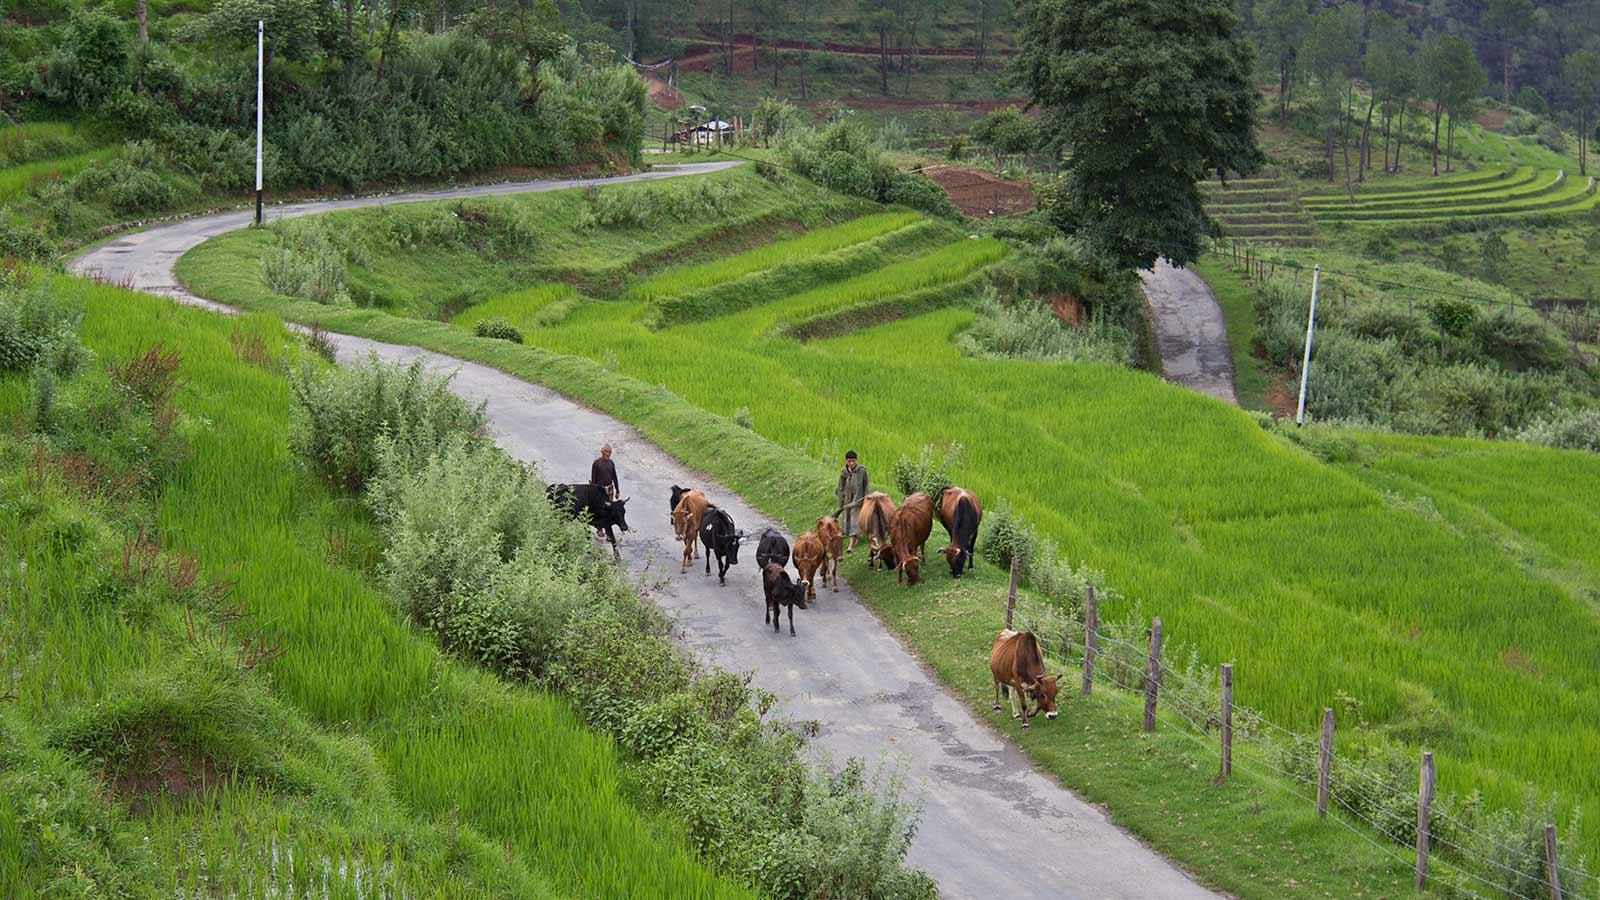 Cow herding in Nobgang, Punakha valley